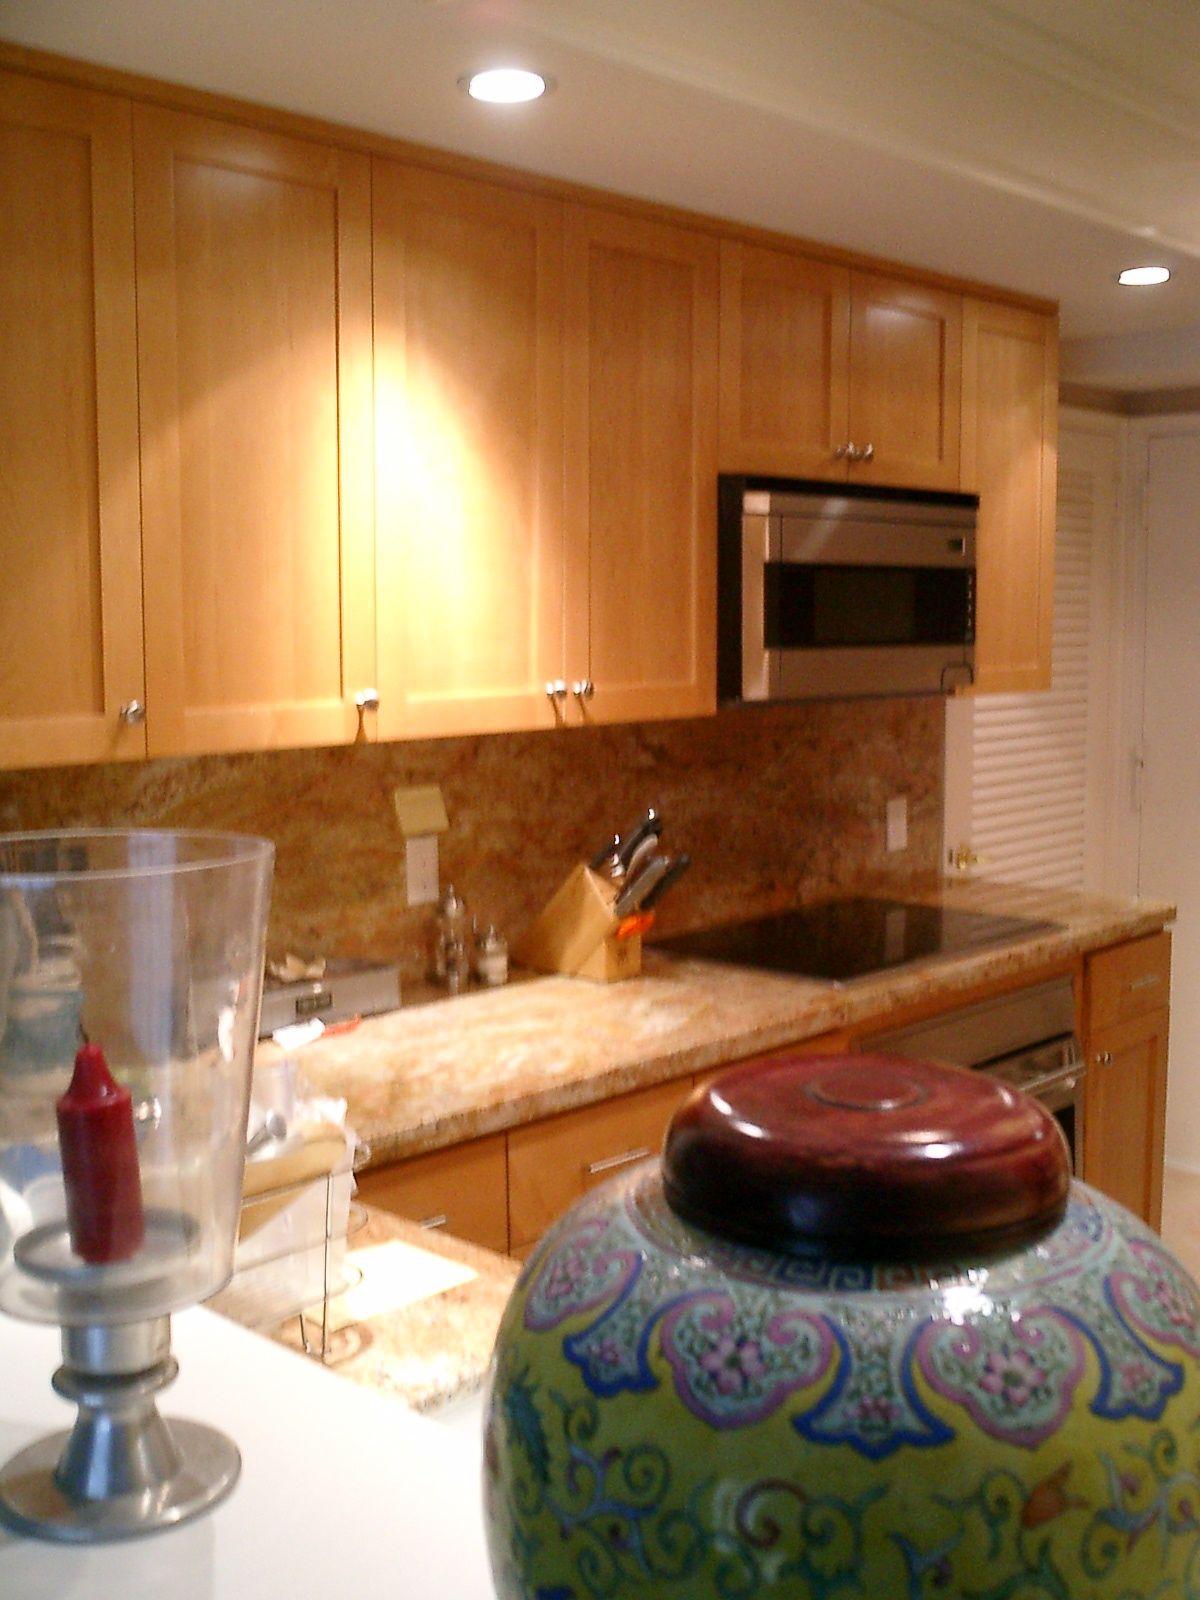 Kitchens-101.jpg